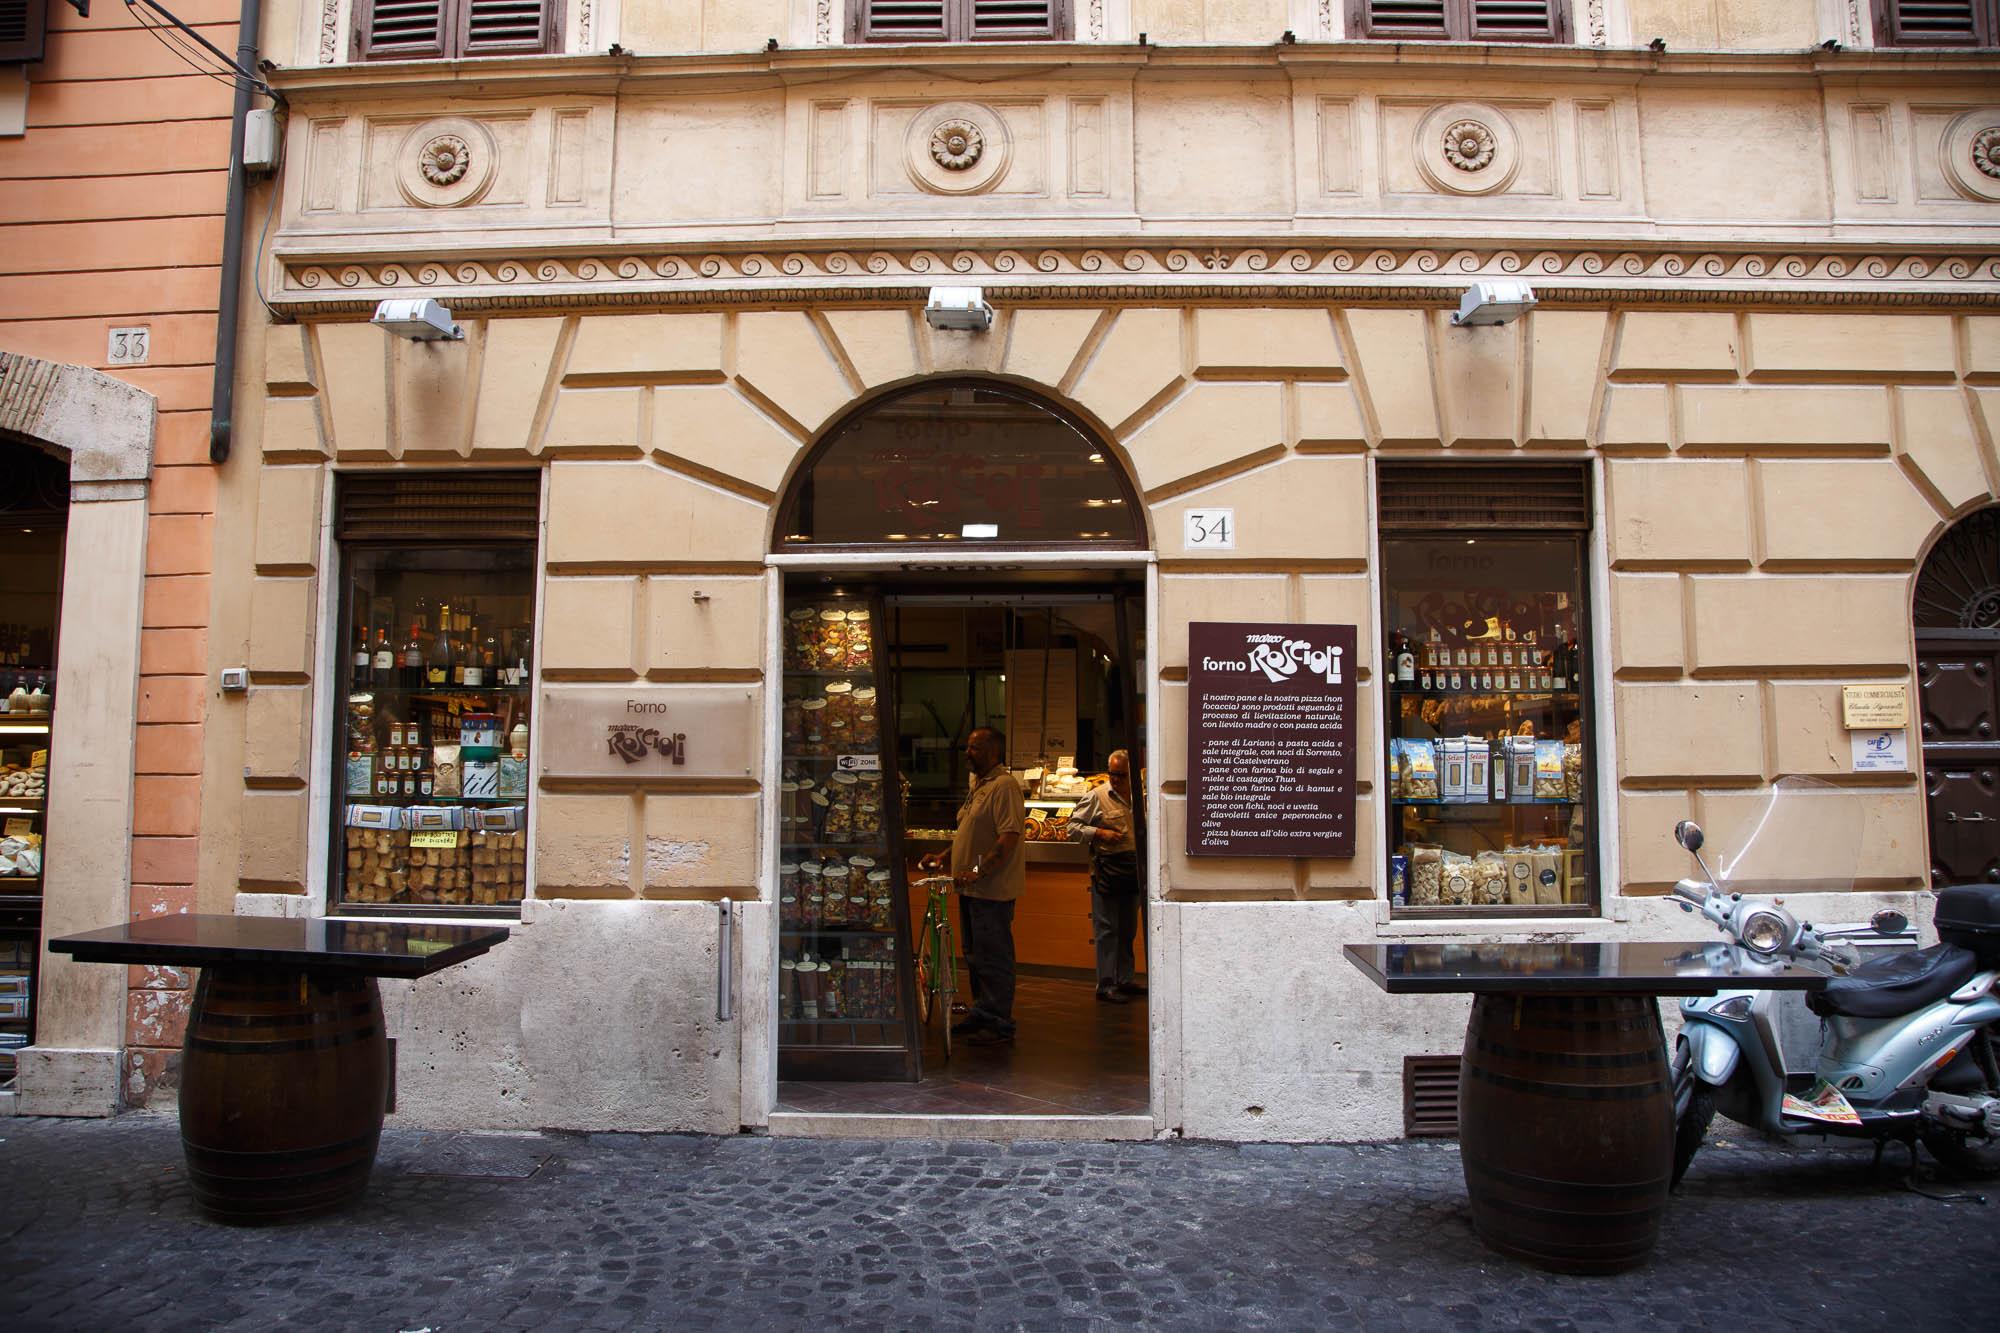 One of our very favorite restaurants in Rome - Ristorante Roscioli.